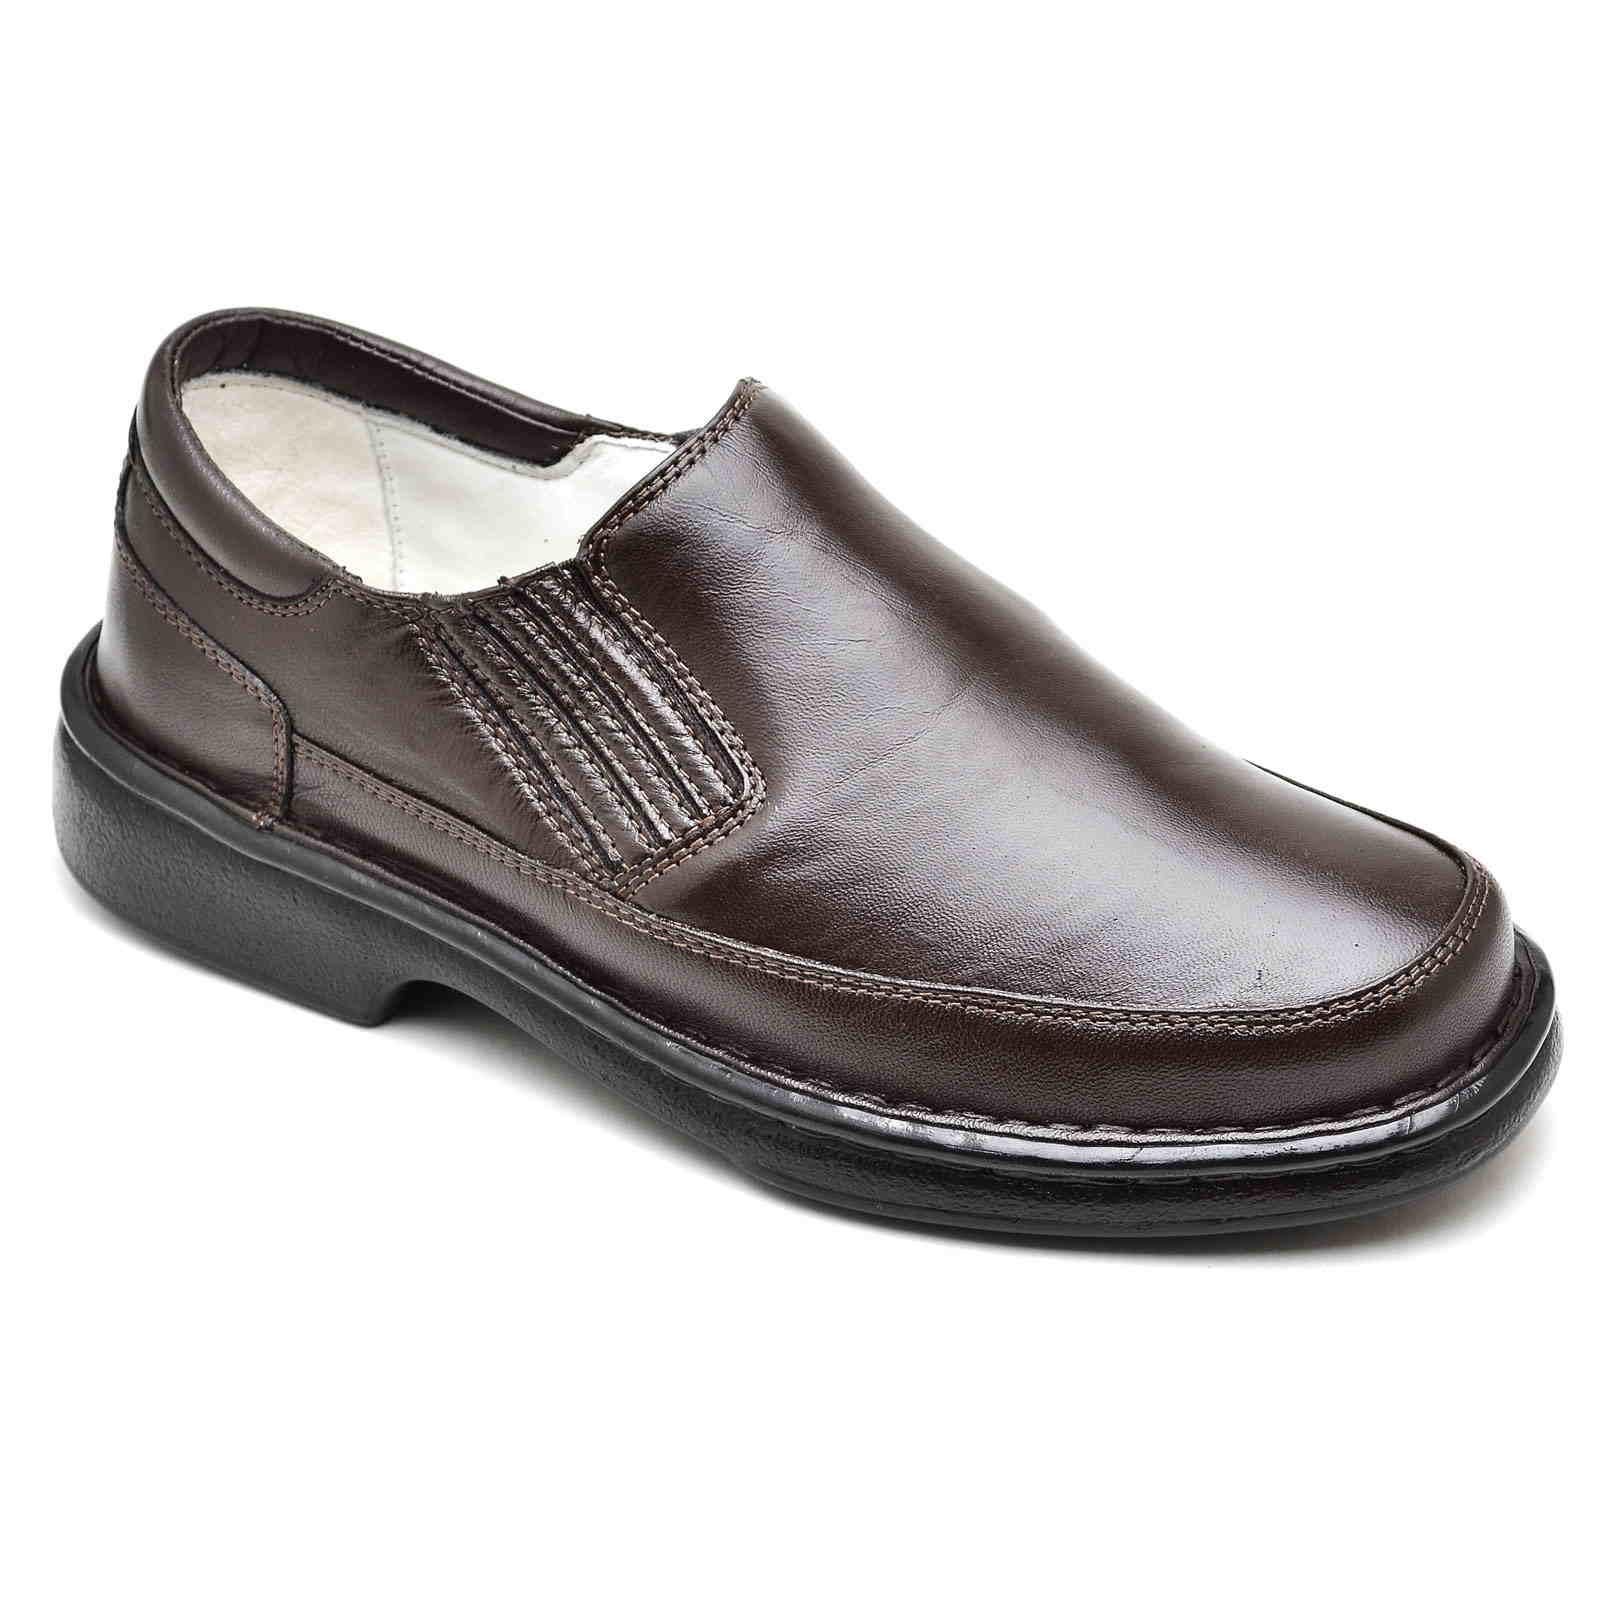 Sapato Casual Confortável Masculino Couro de Carneiro